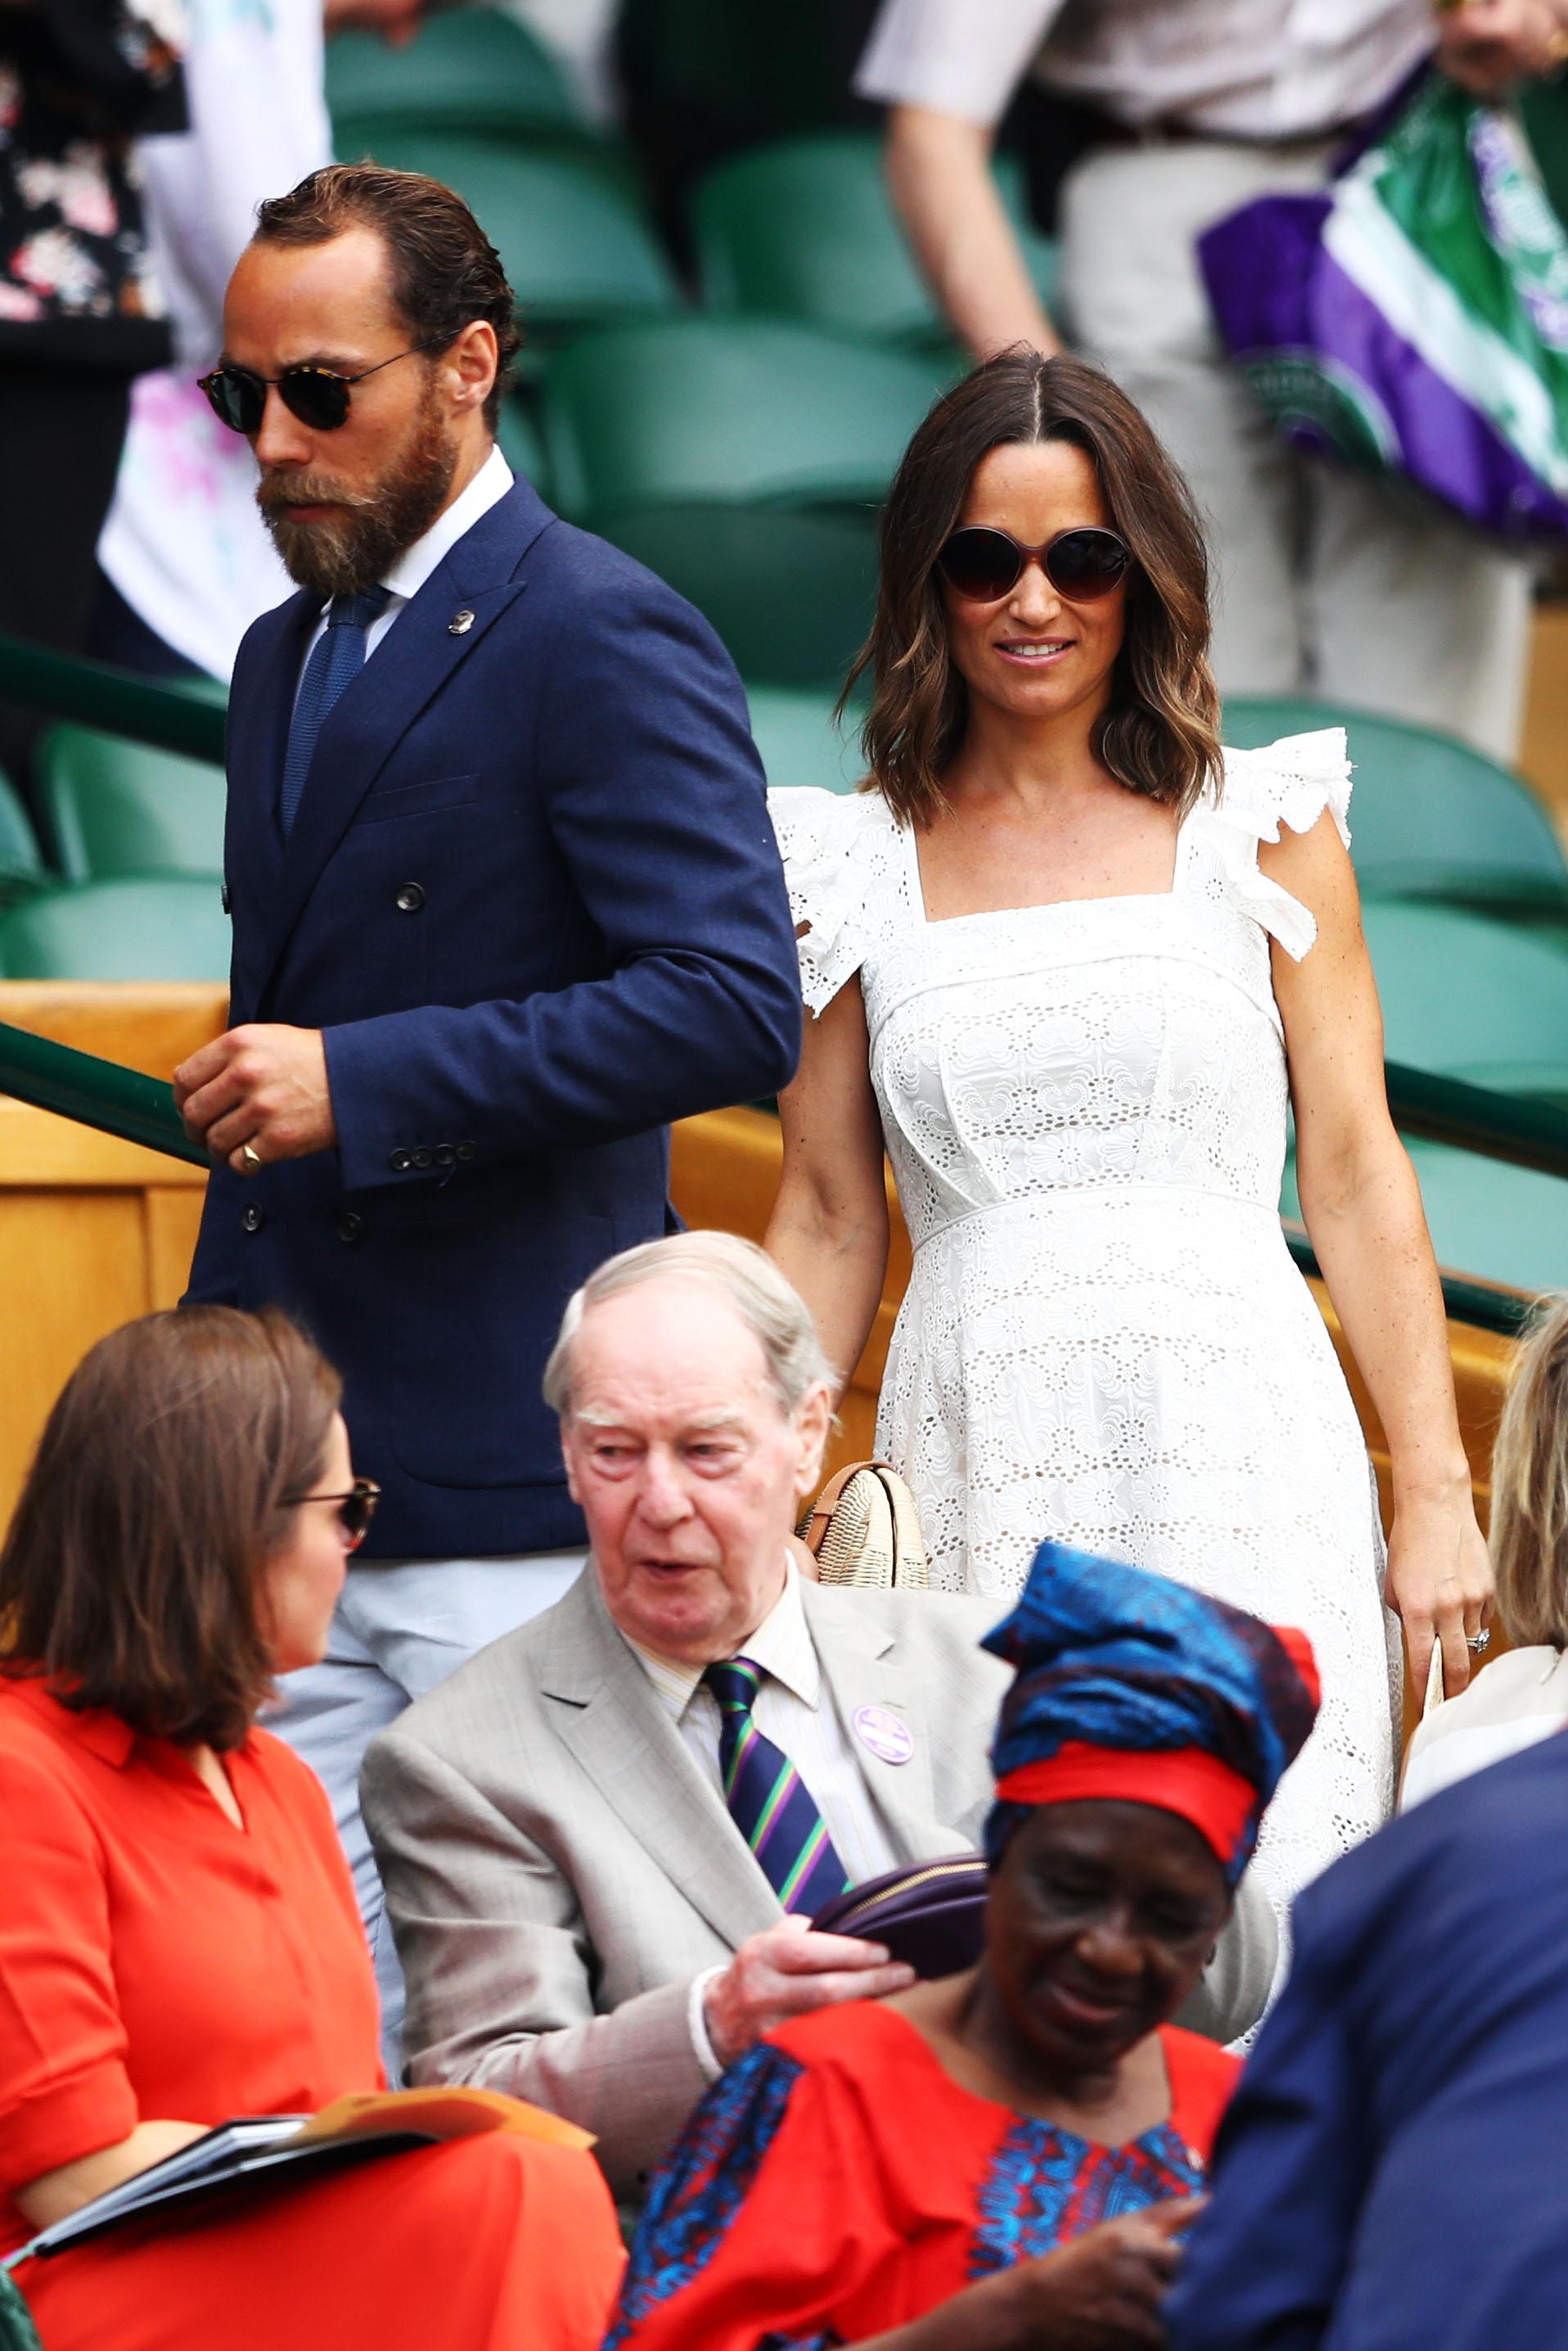 Pippa Middleton & James Middleton